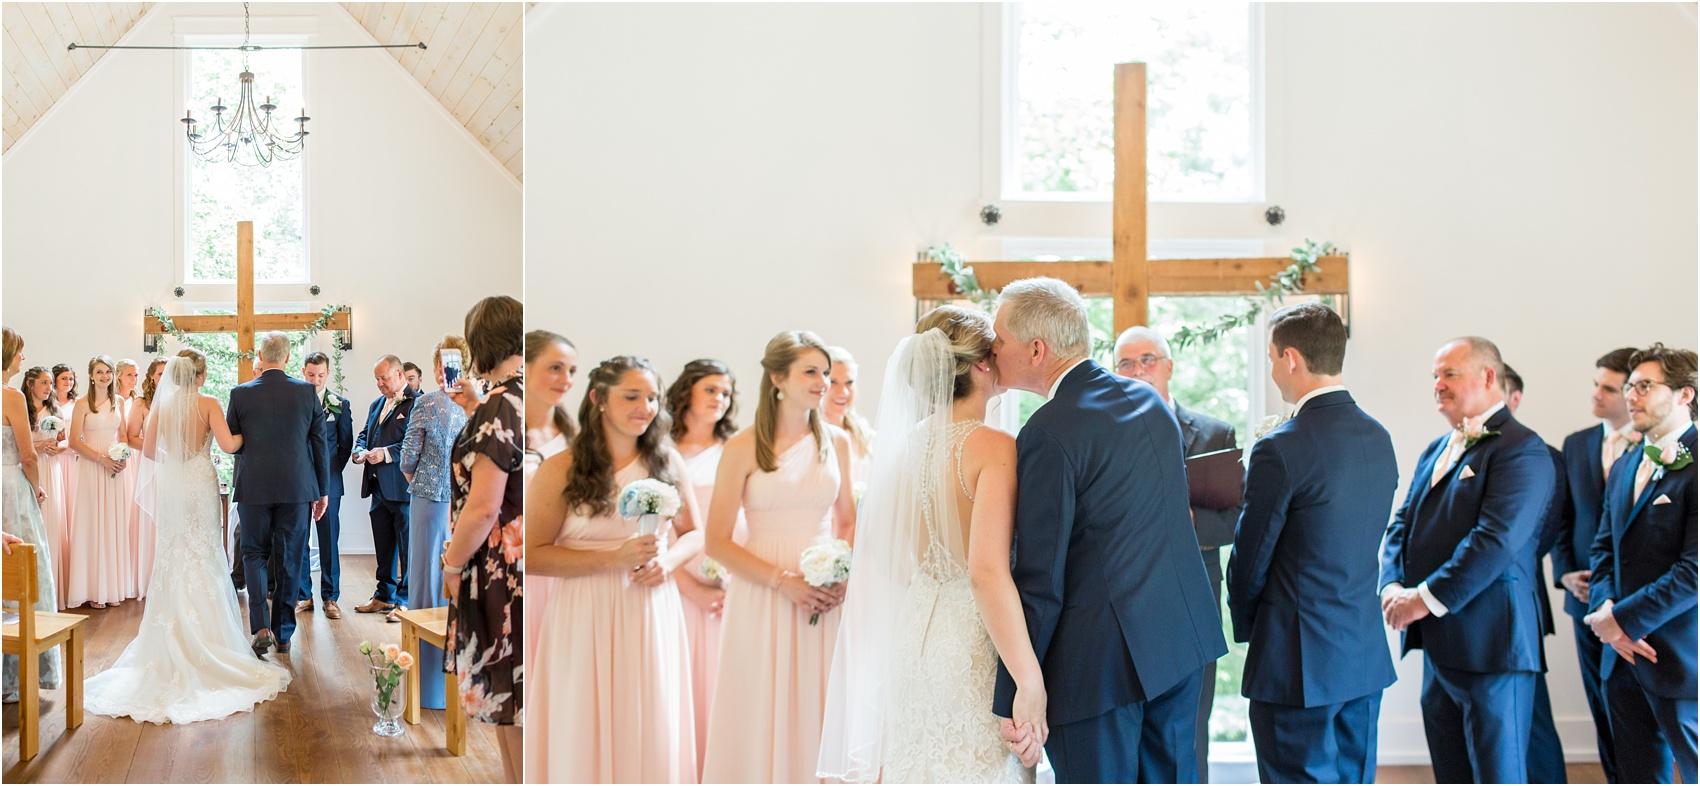 Savannah Eve Photography- Roper-Powell Wedding- Blog-25.jpg